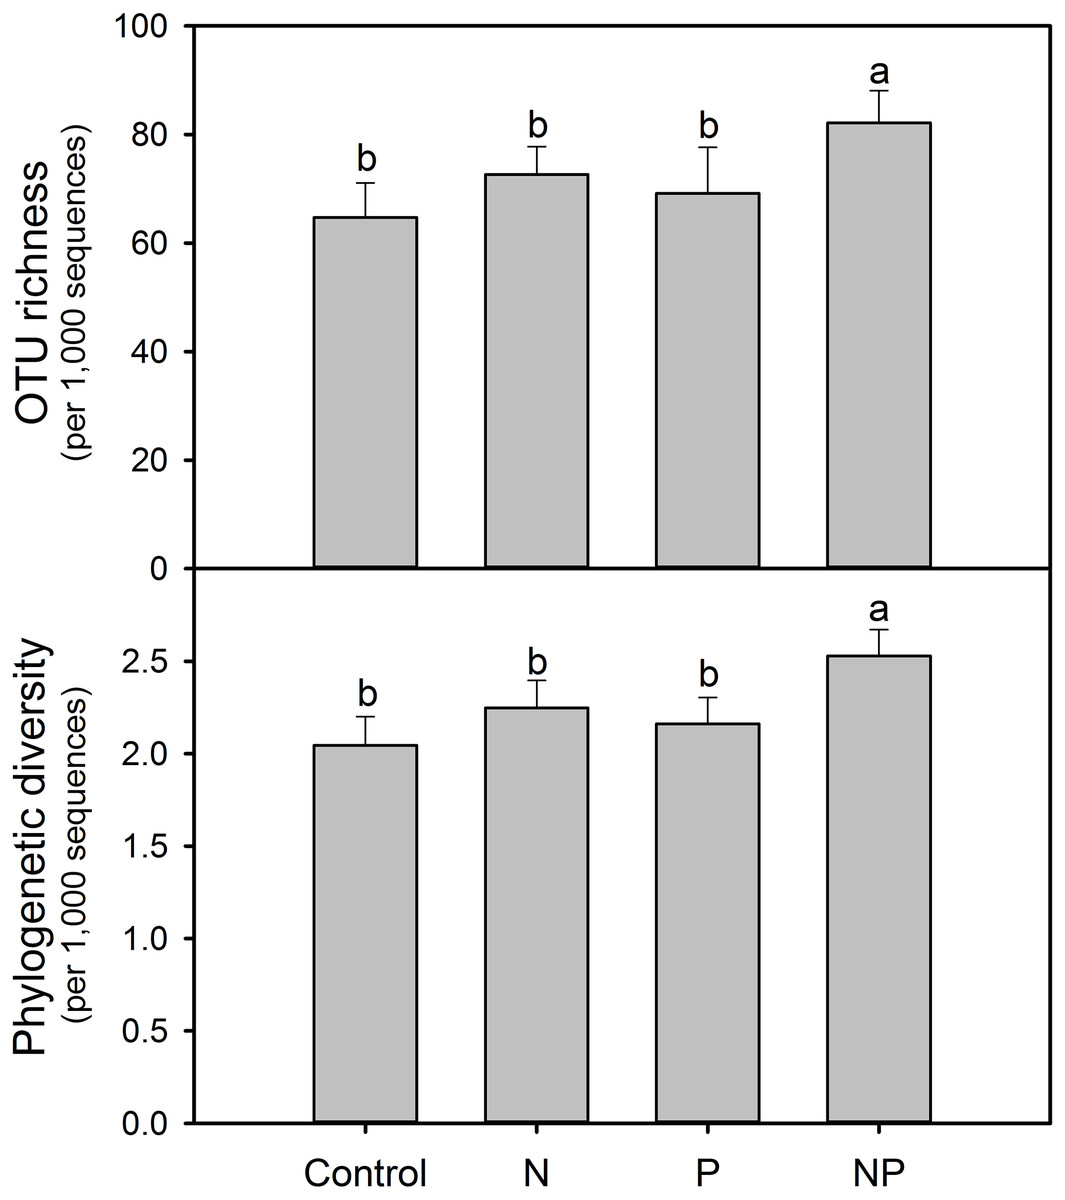 Amf Bz rapid response of arbuscular mycorrhizal fungal communities